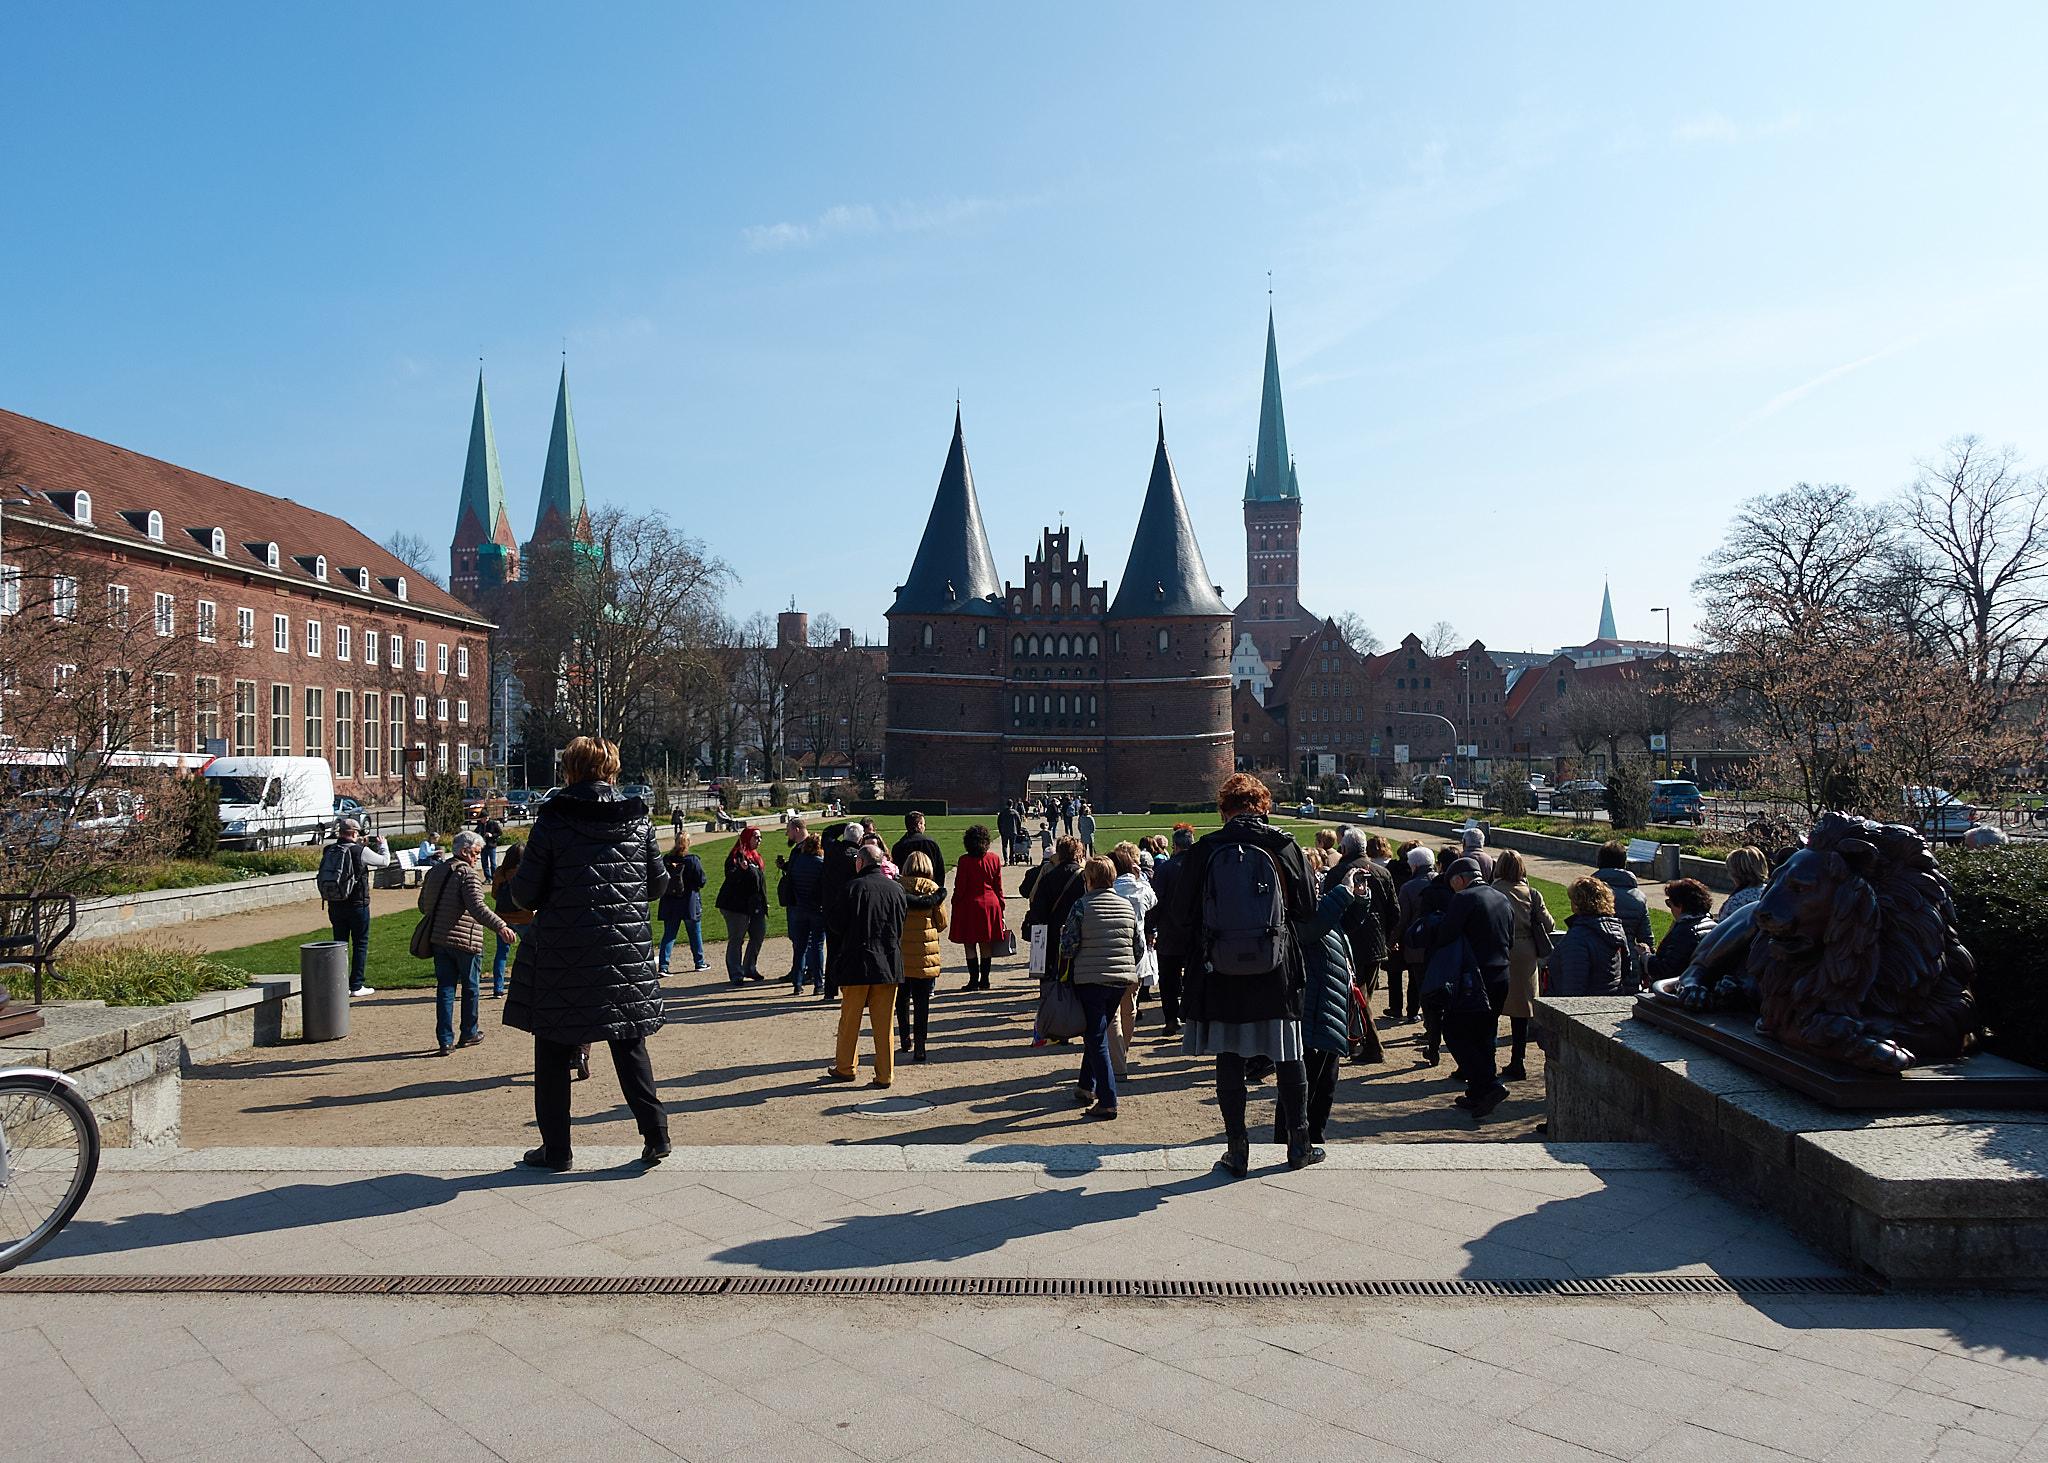 20190330-Lübeck-301.jpg